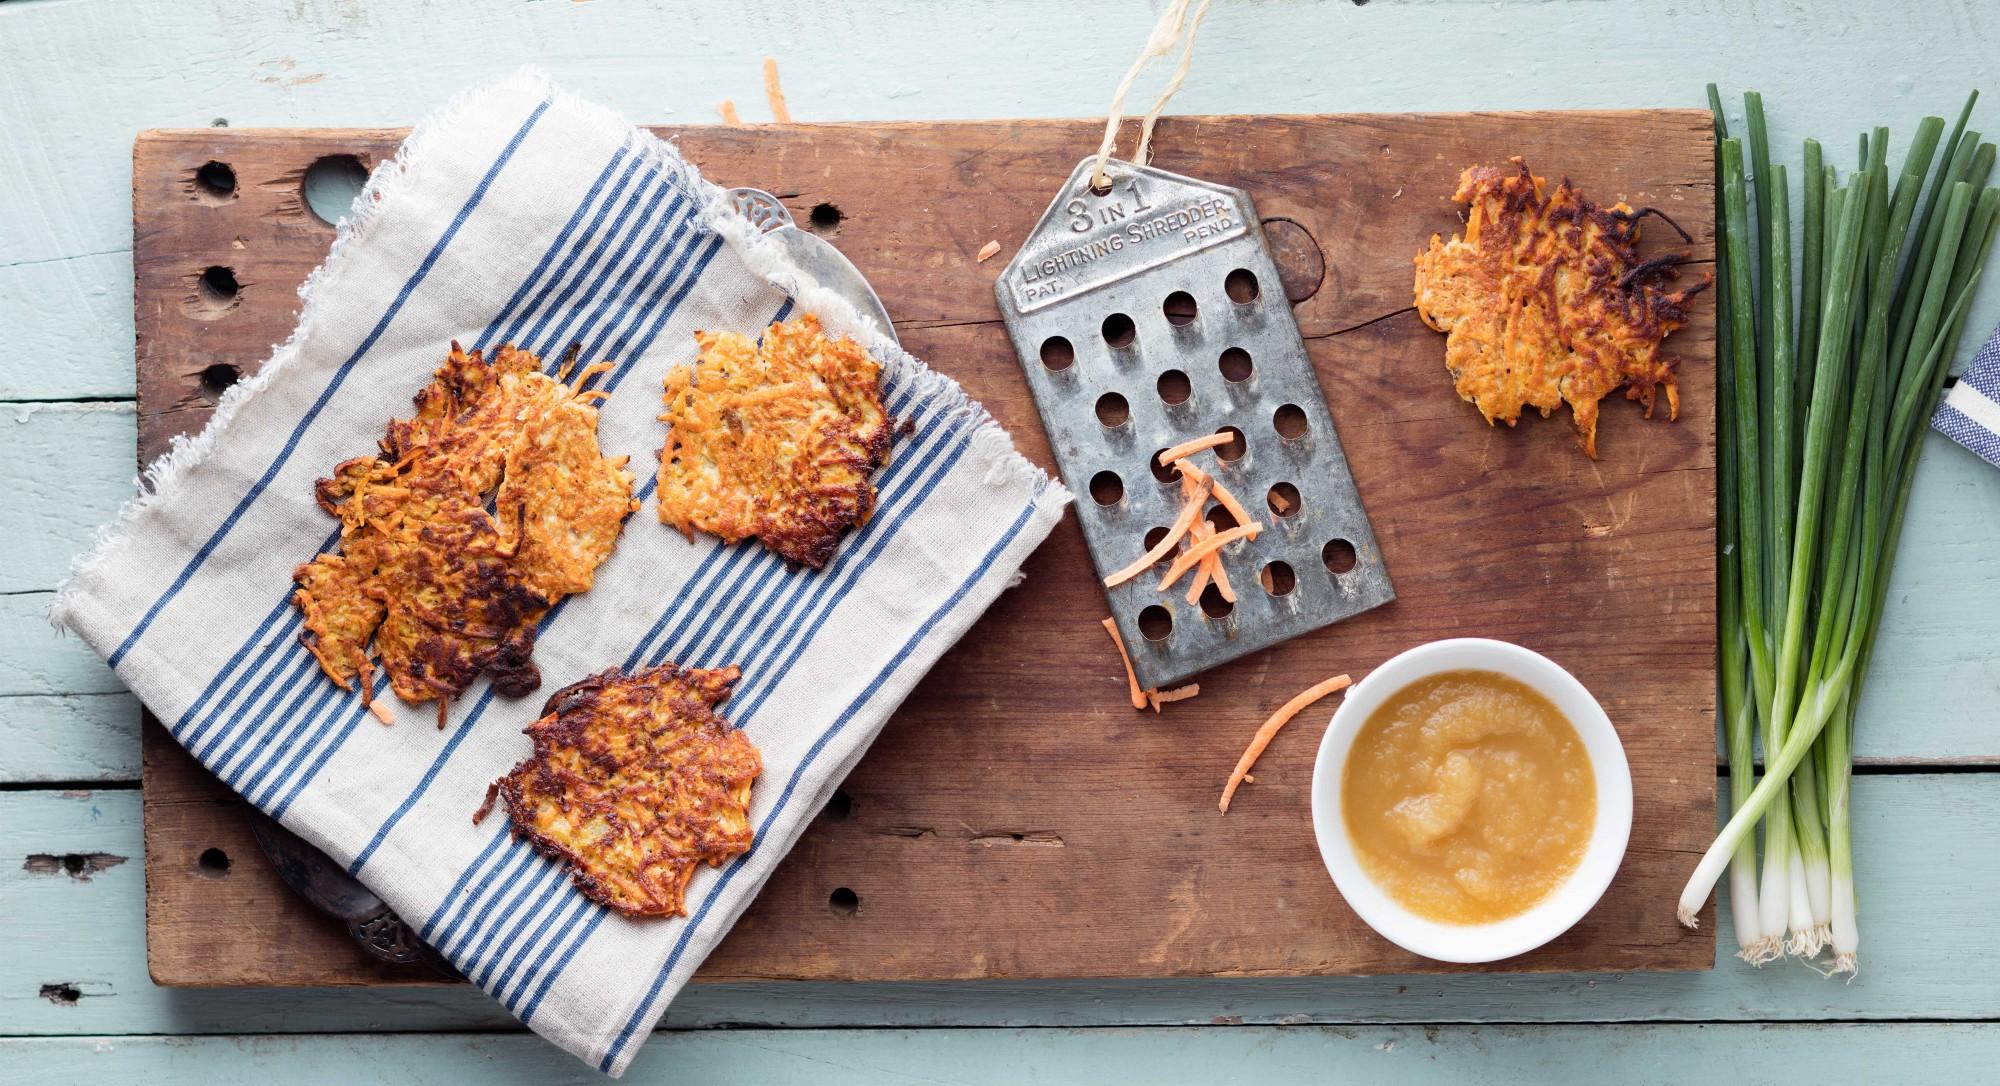 Celebrate Hanukkah the Paleo Way With Sweet Potato Latkes